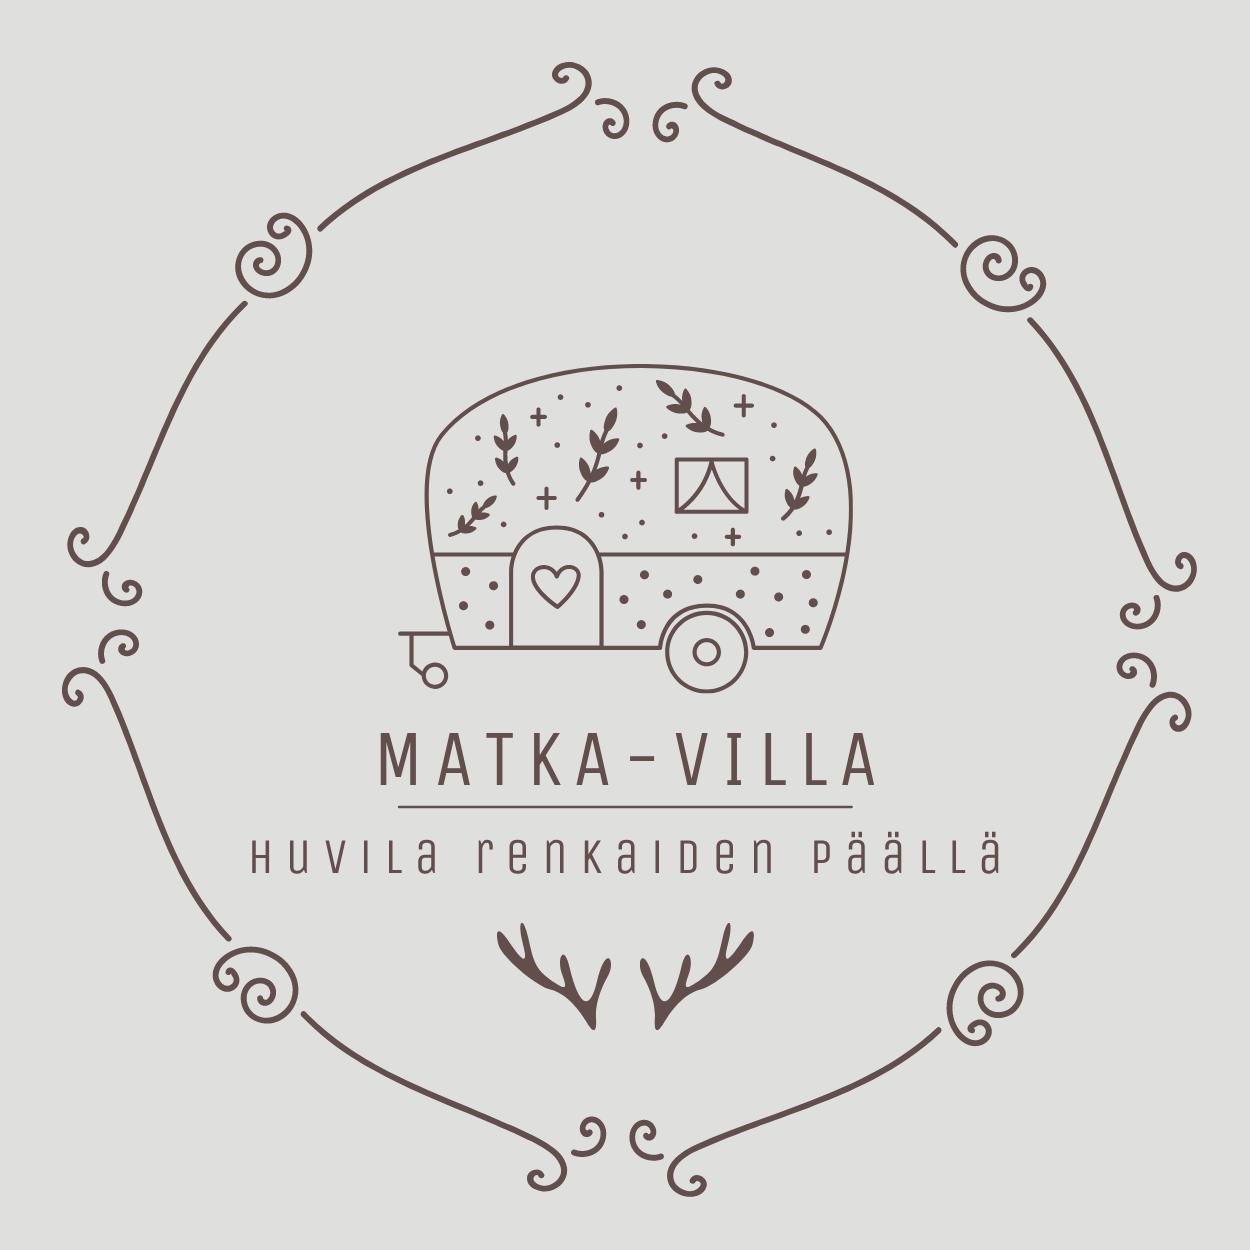 Matka-Villa